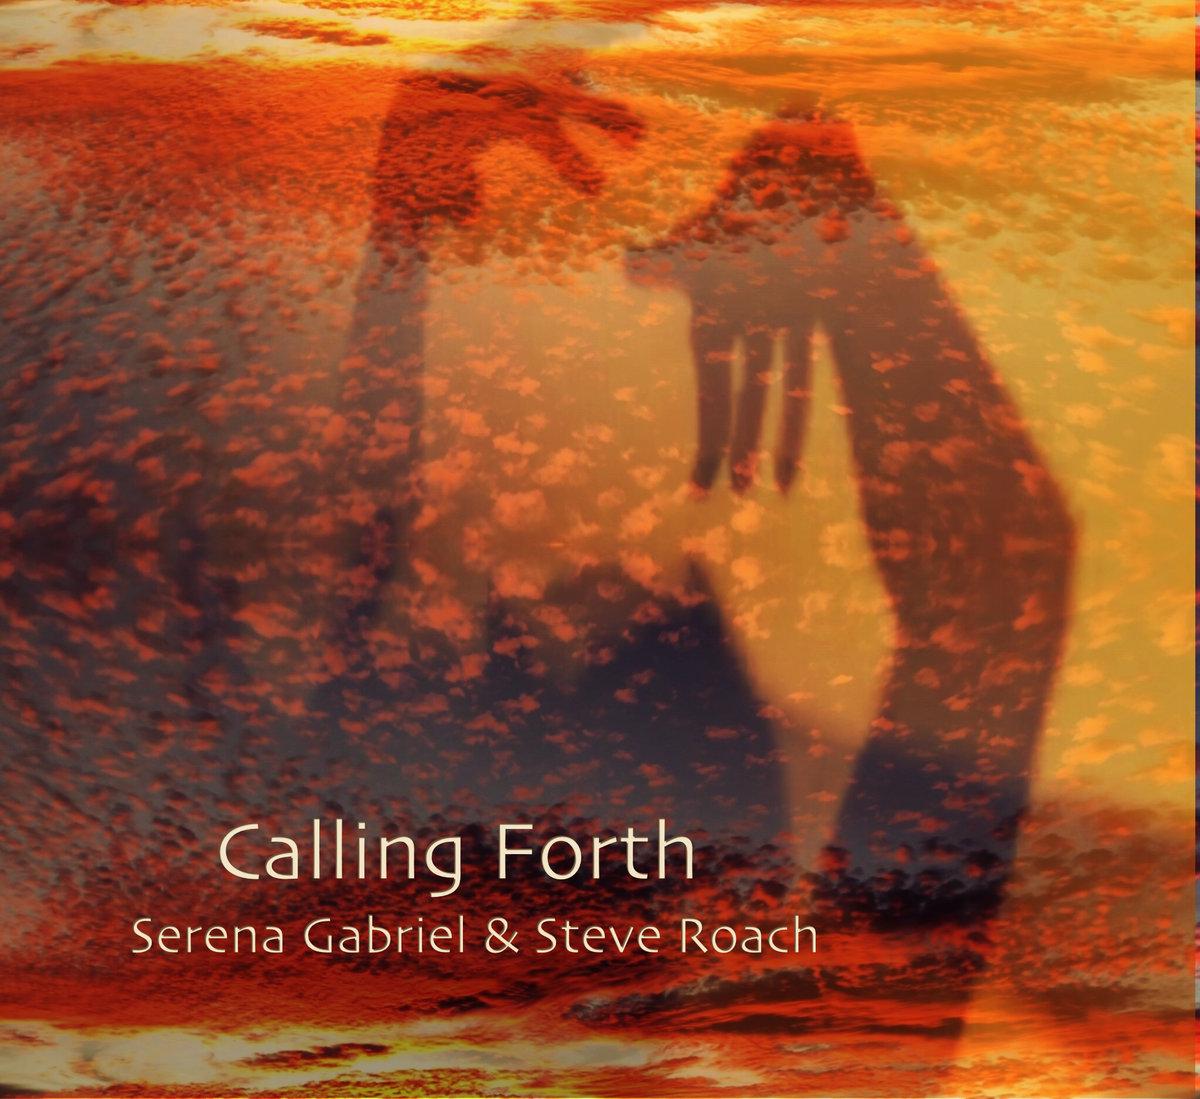 Serena Gabriel & Steve Roach — Calling Forth